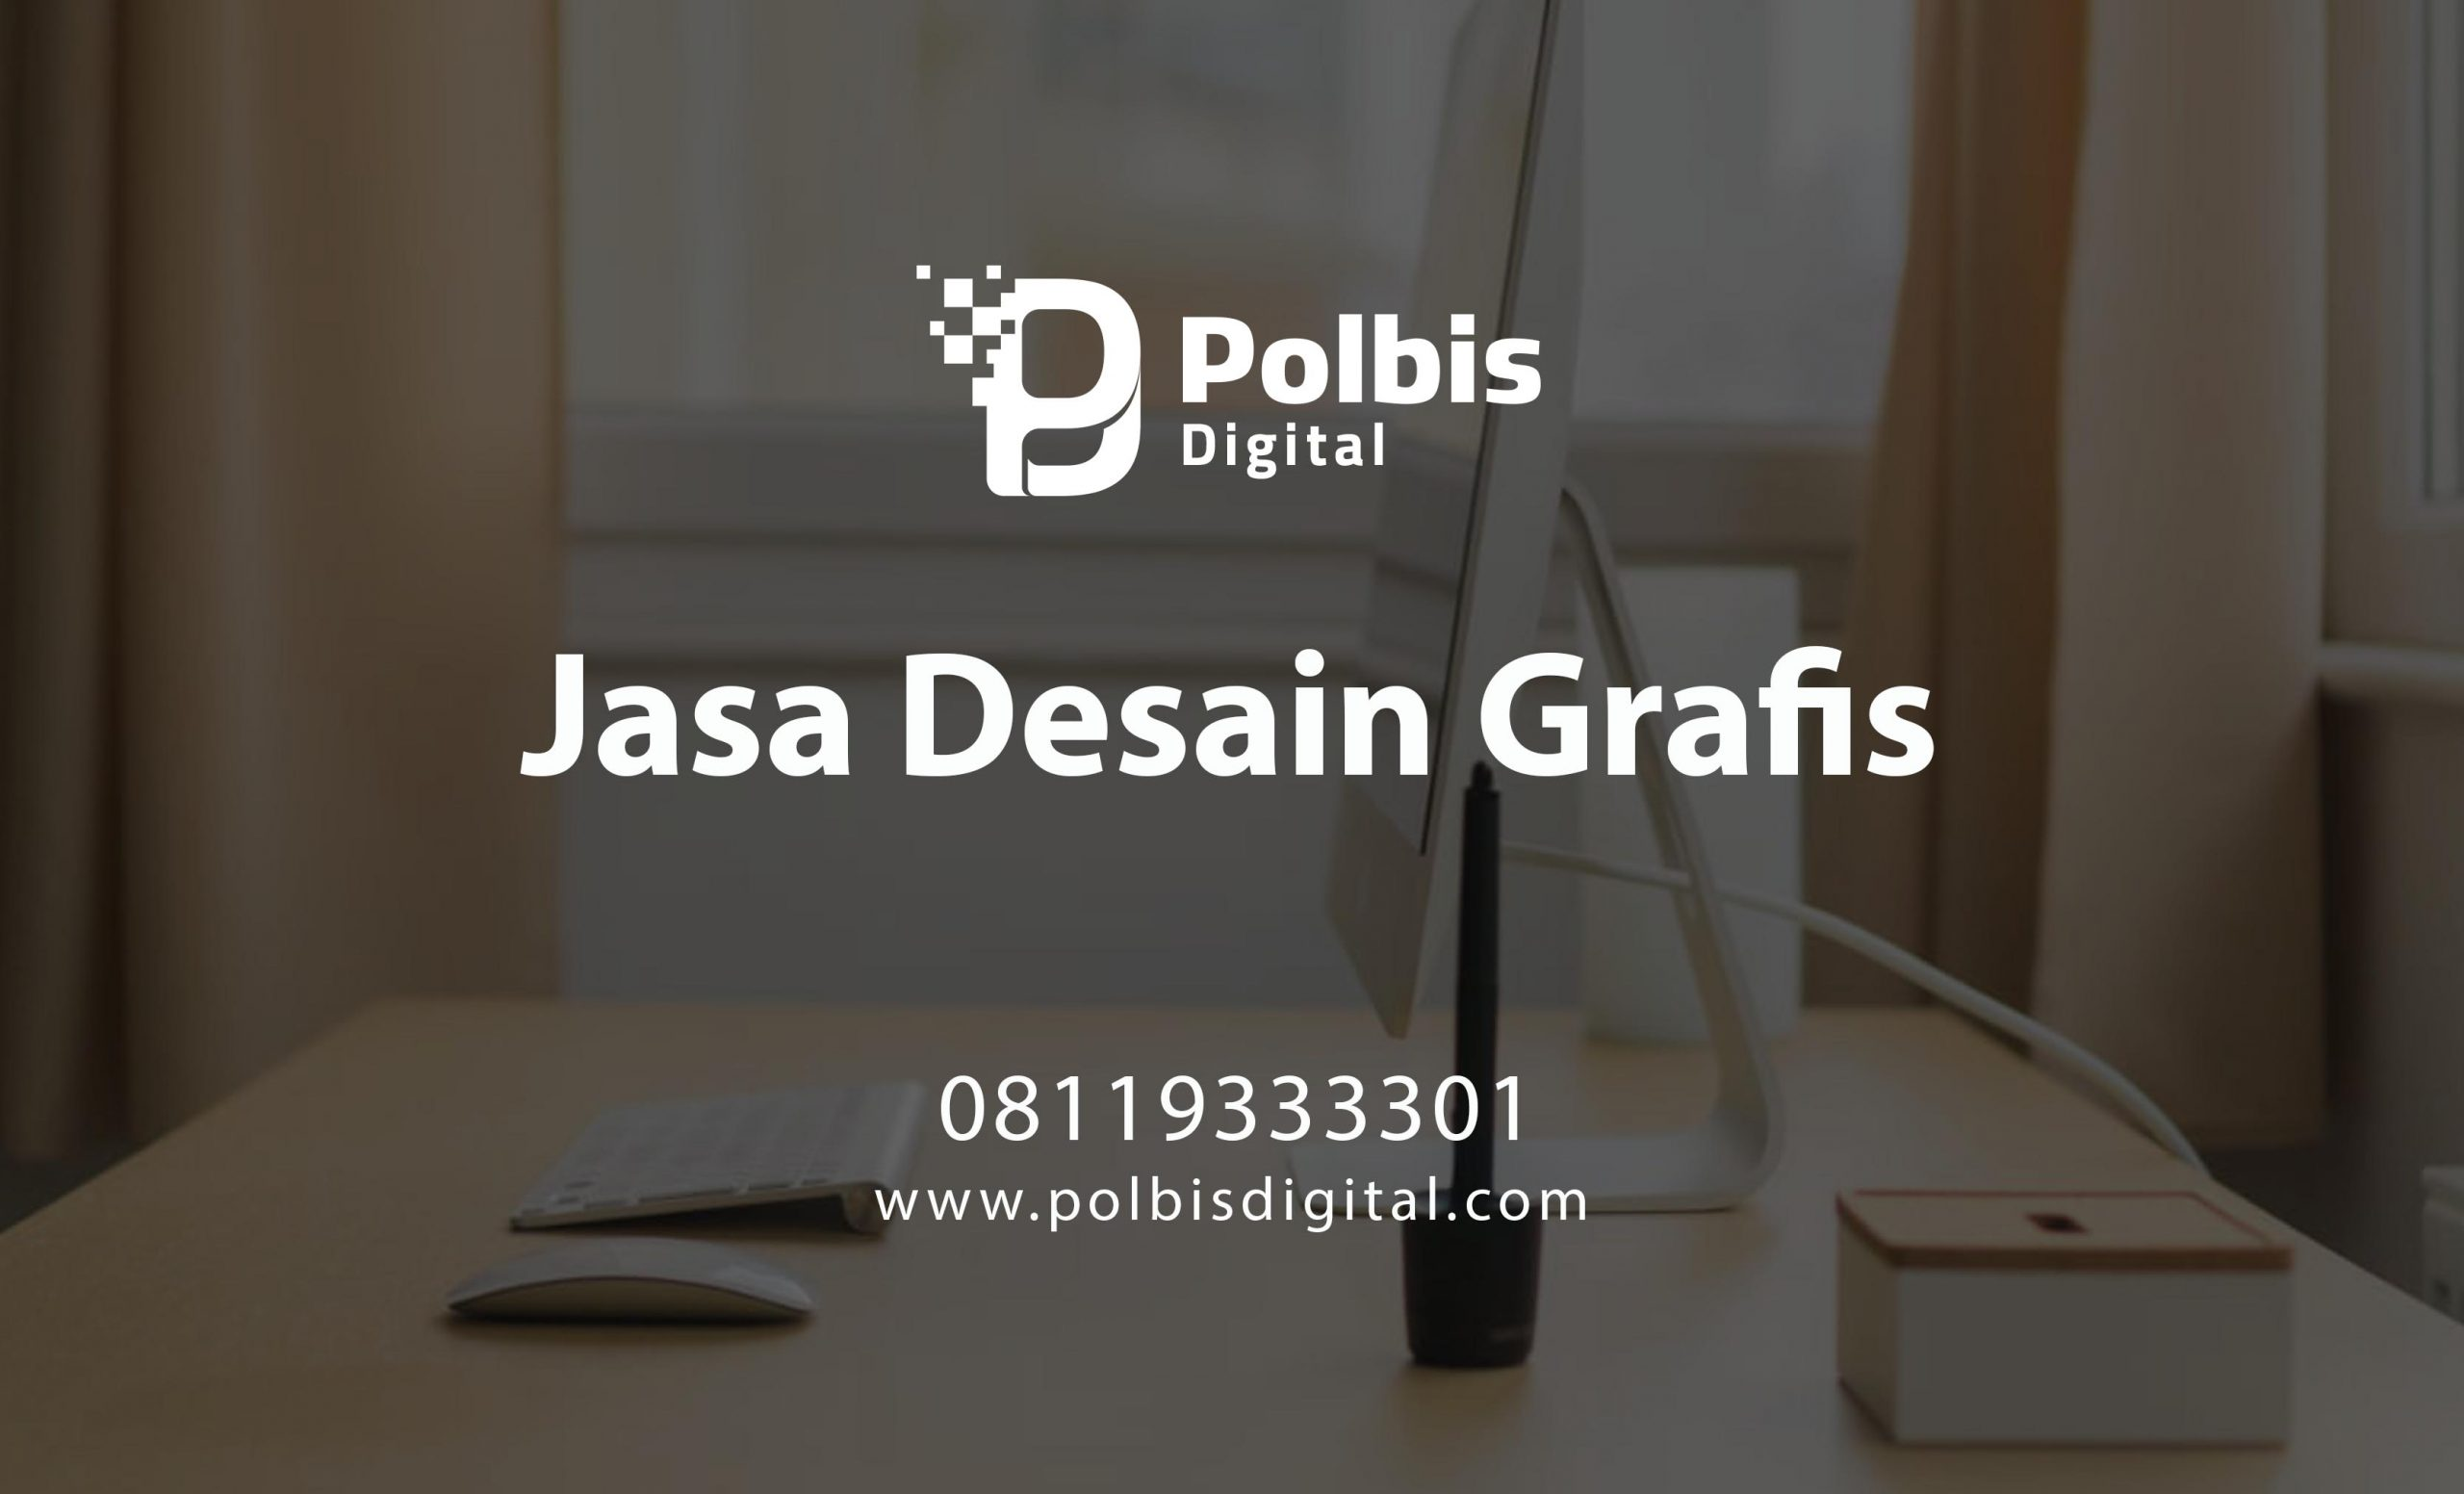 JASA DESAIN GRAFIS LANDAK